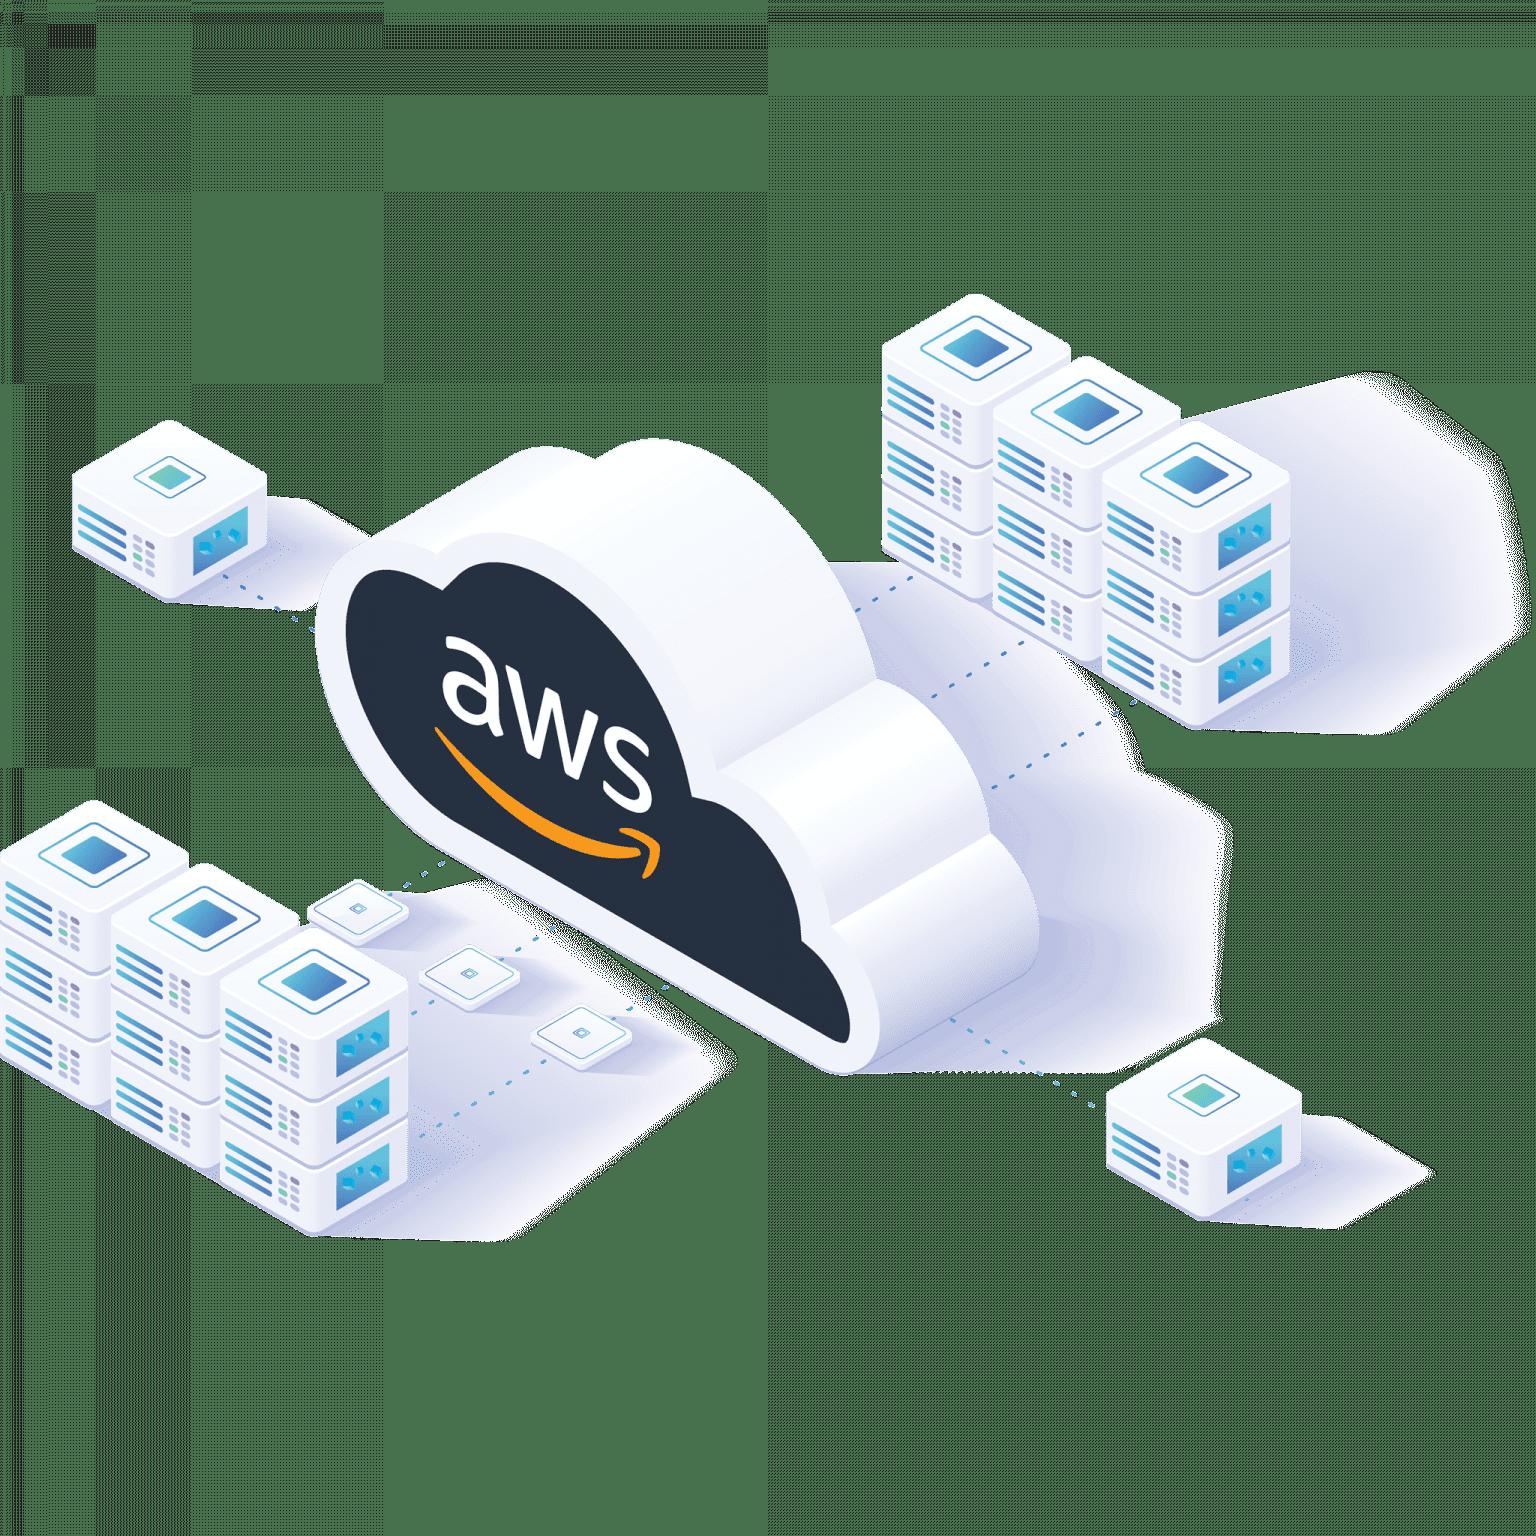 Chicago AWS Cloud Development